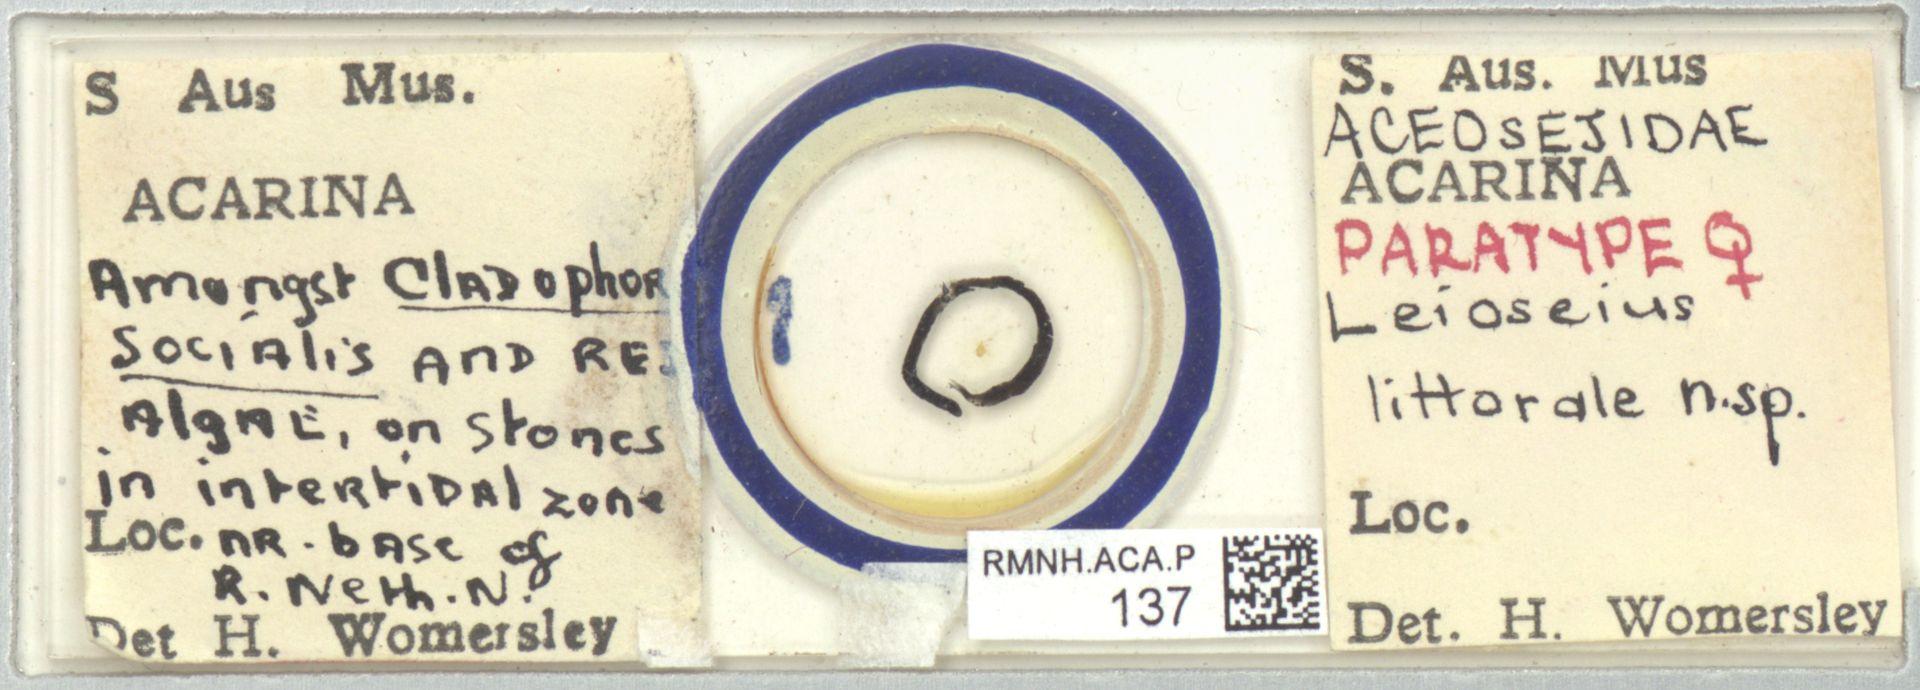 RMNH.ACA.P.137 | Leioseius littorale Womersley